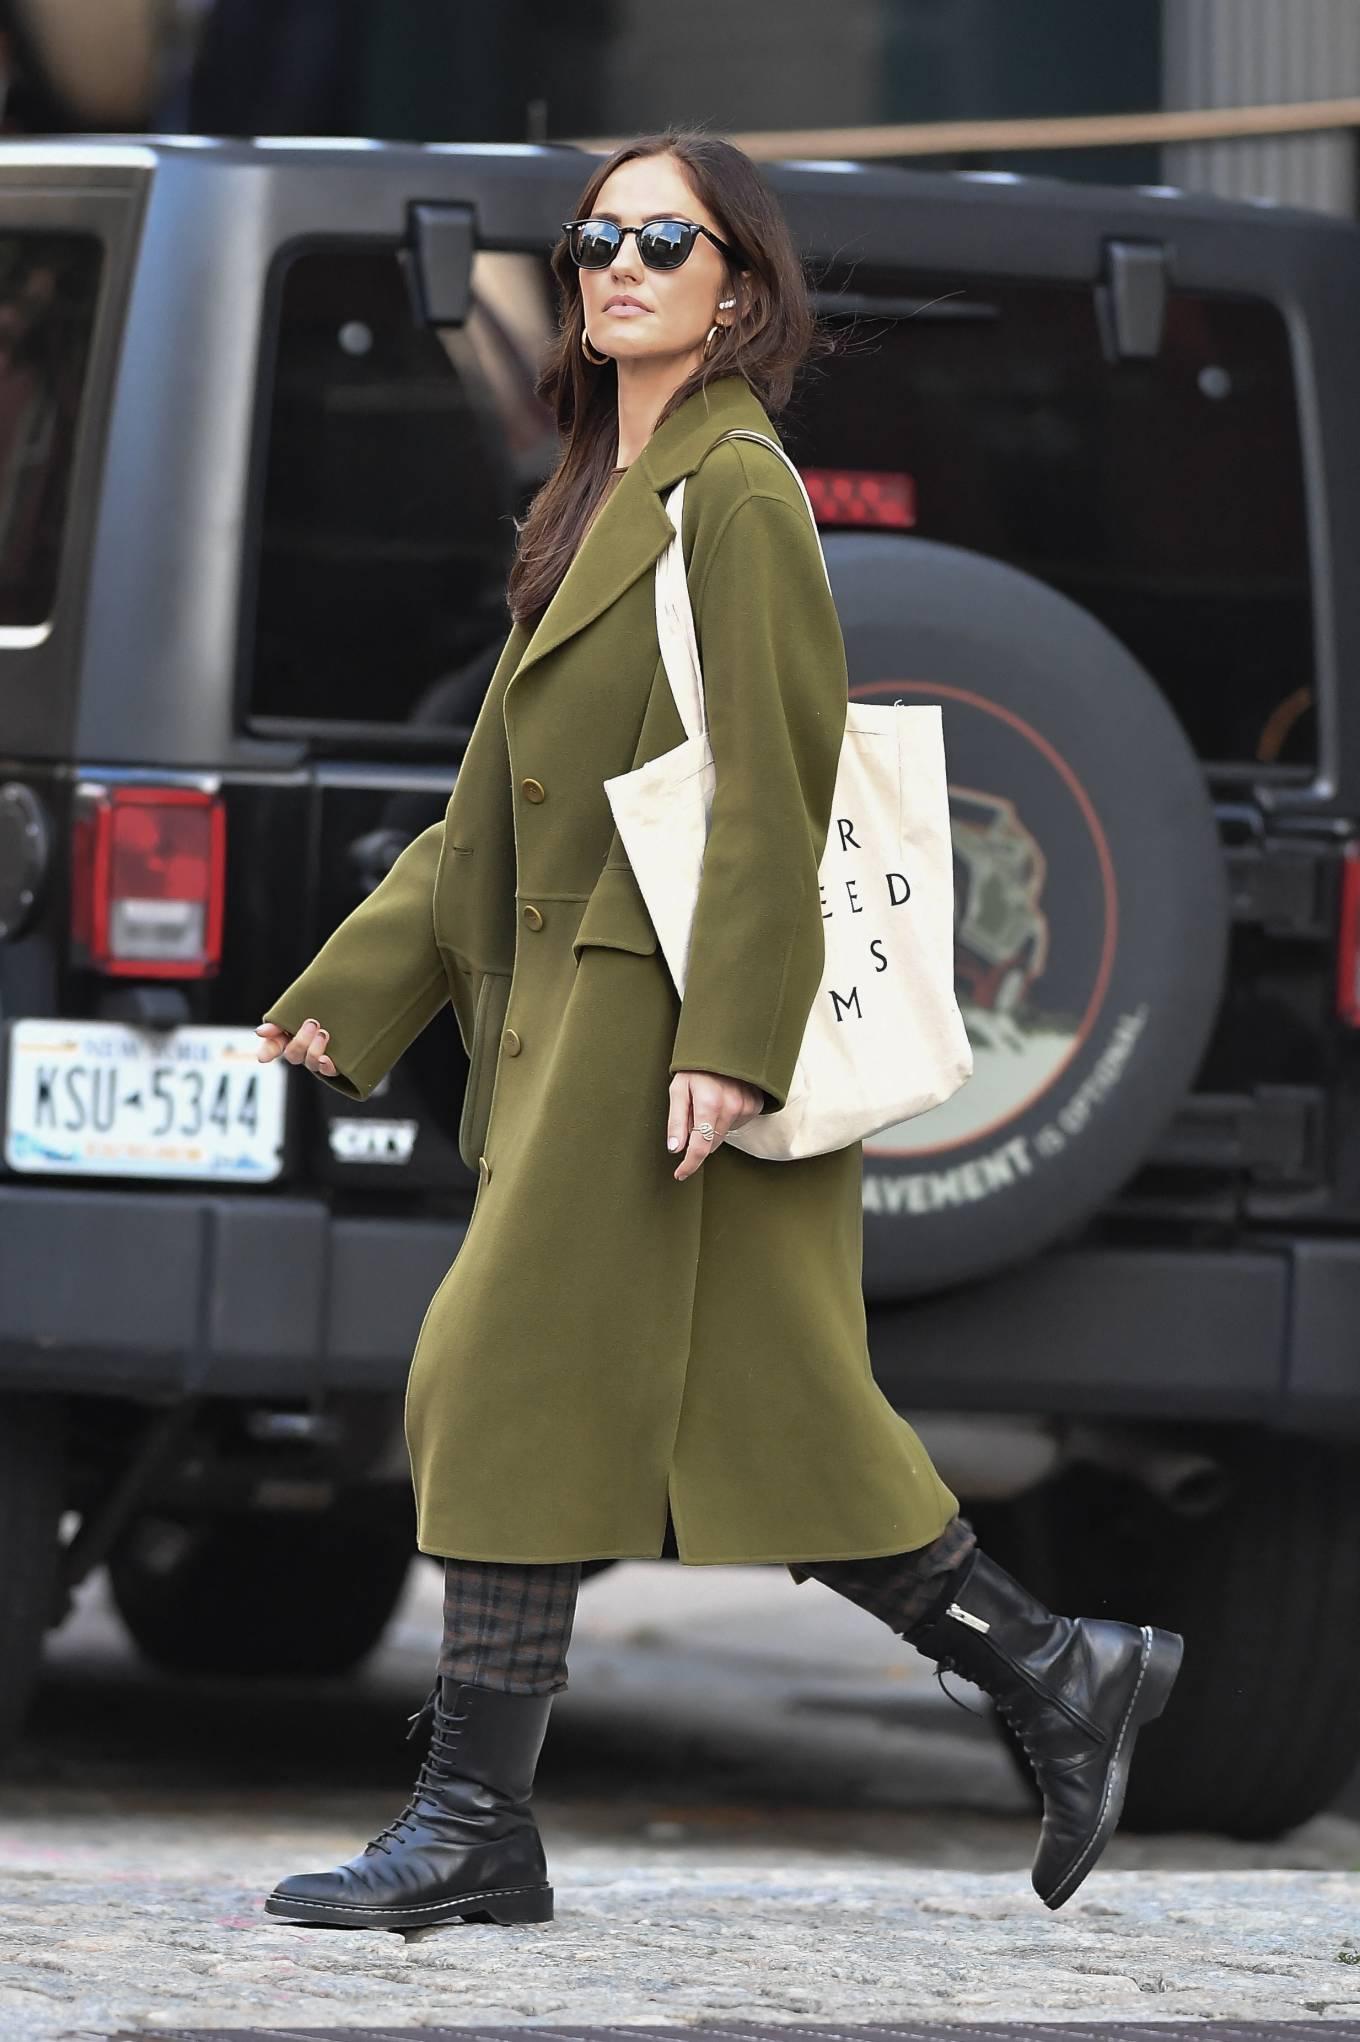 Minka Kelly 2021 : Minka Kelly – In olive green runs errands in New York-28